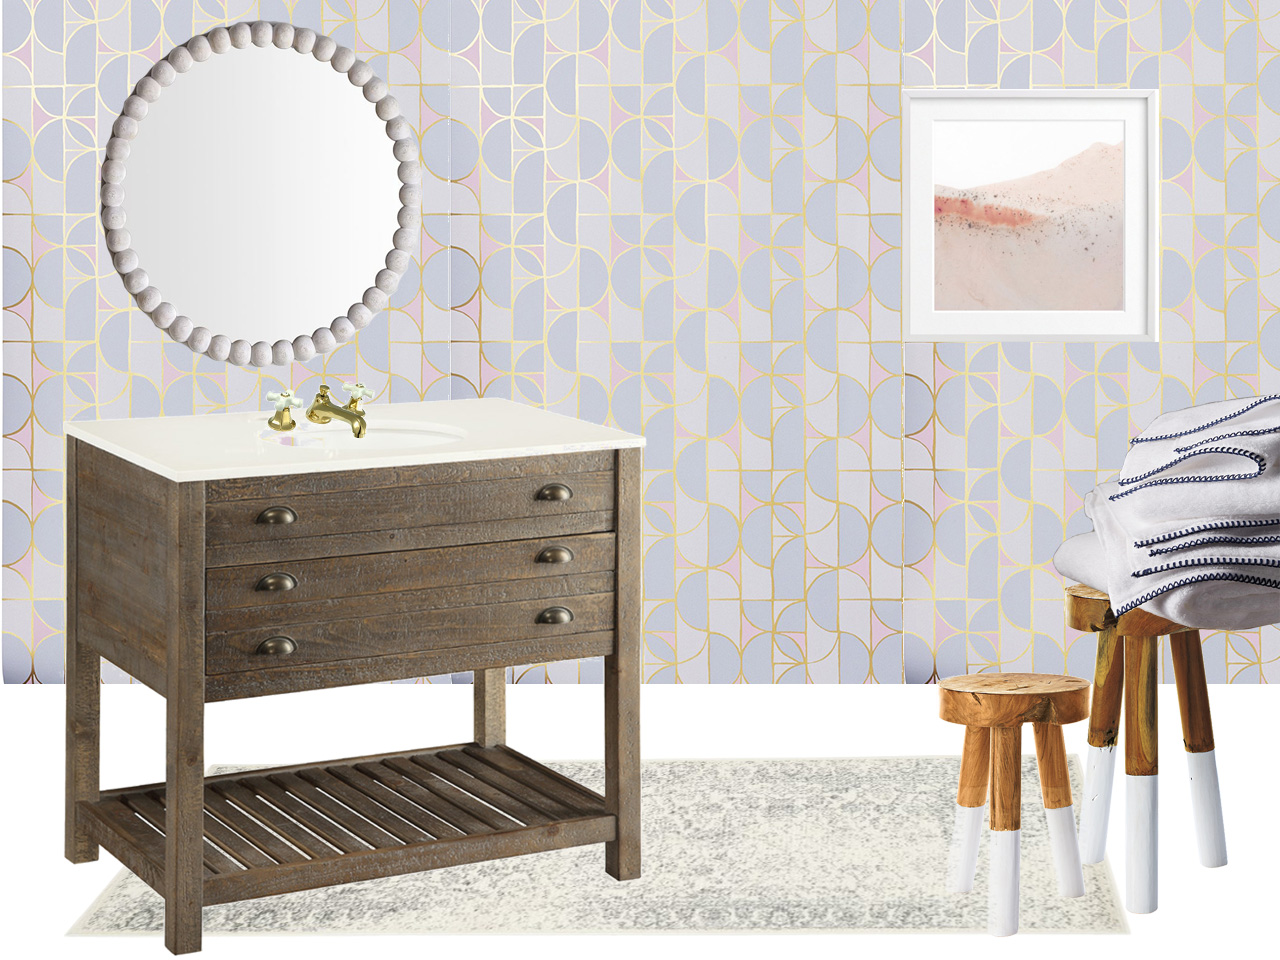 Half-bath-decor-idea.jpg